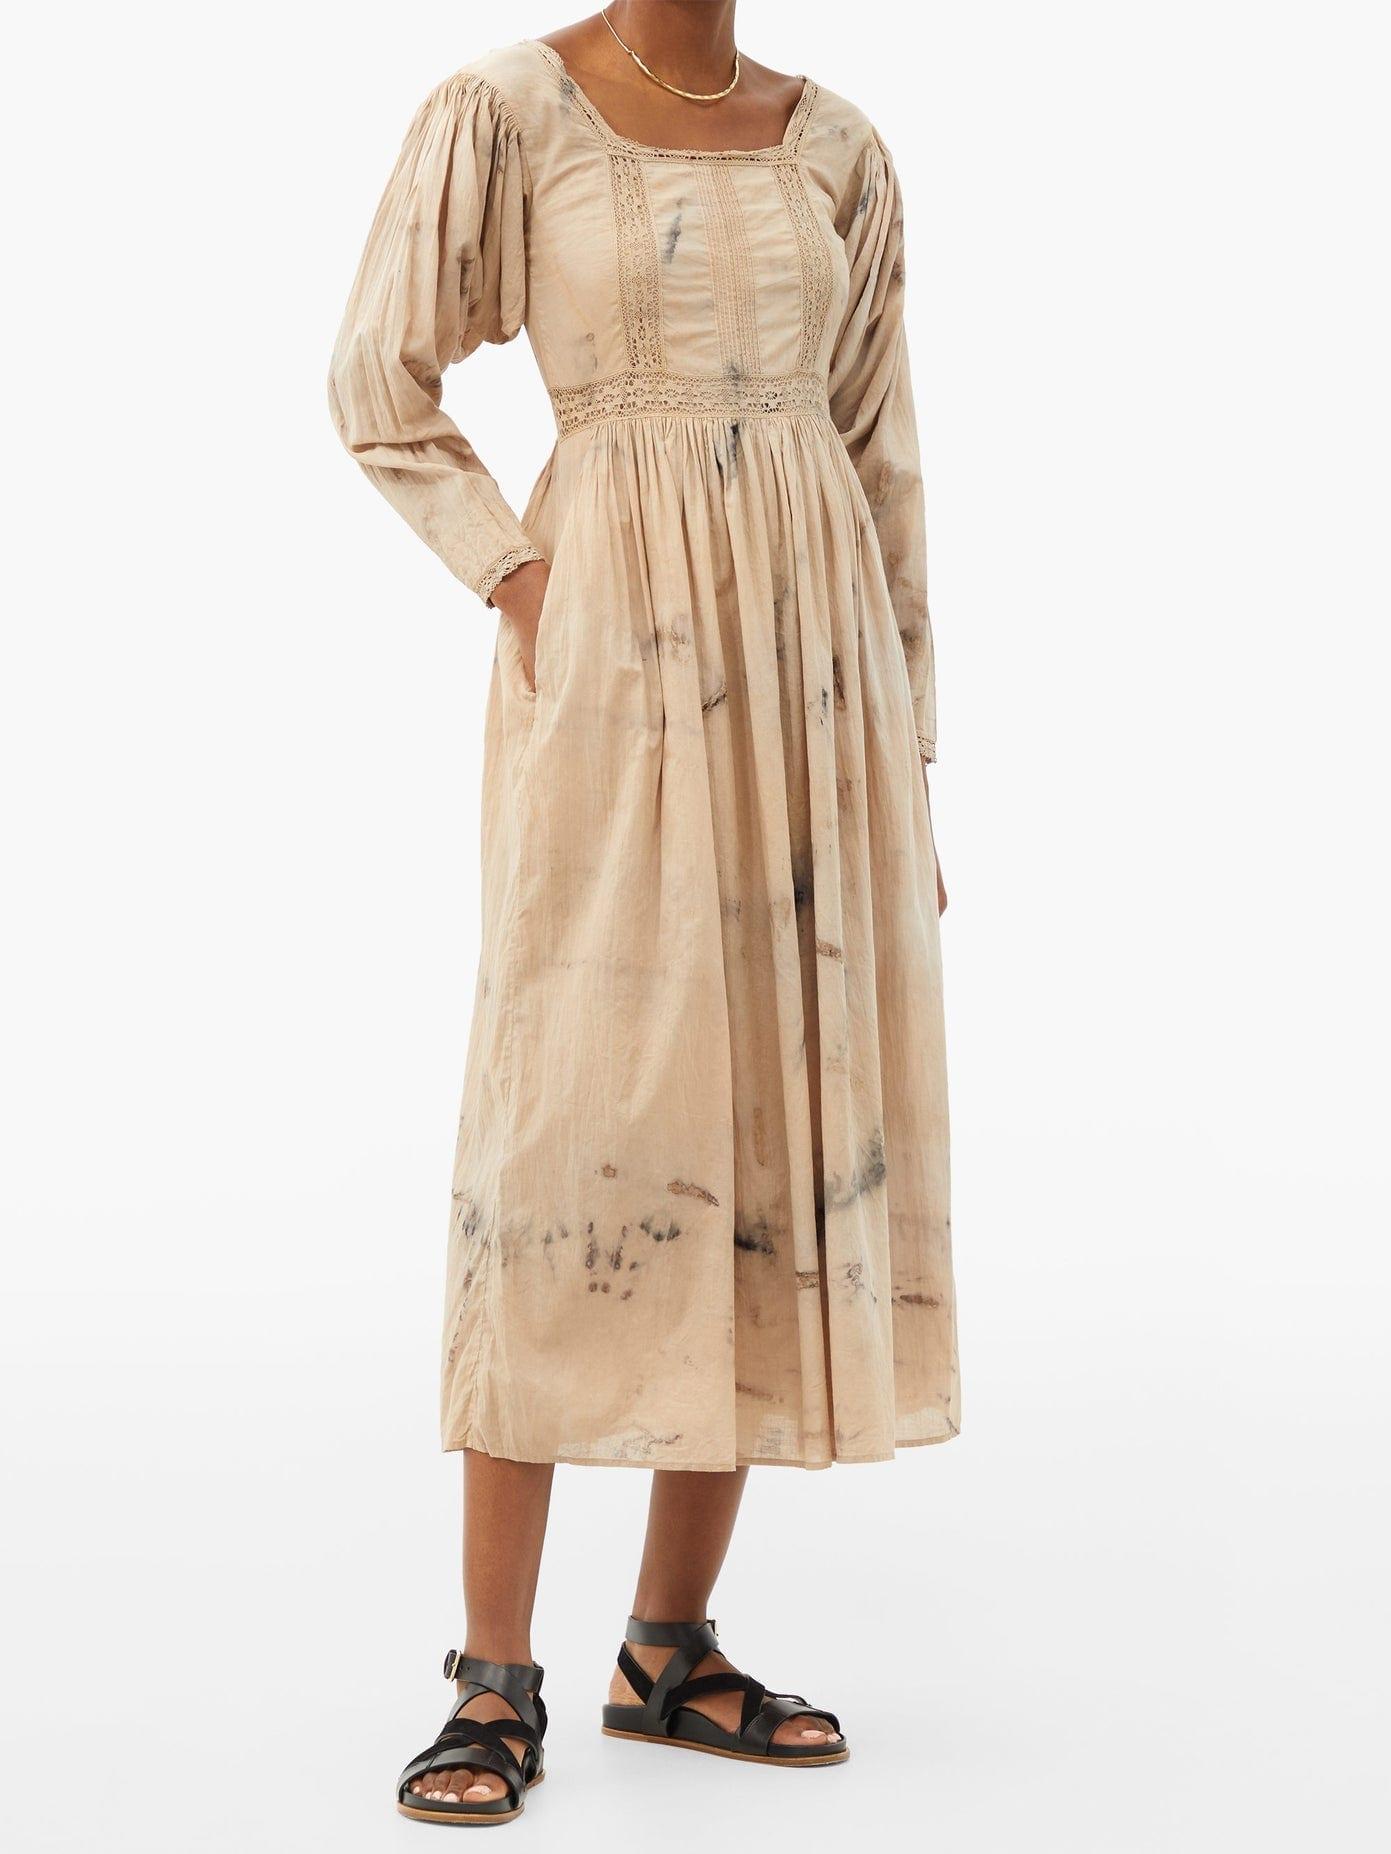 MIMI PROBER Catherine Botanical-dyed Cotton Midi Dress